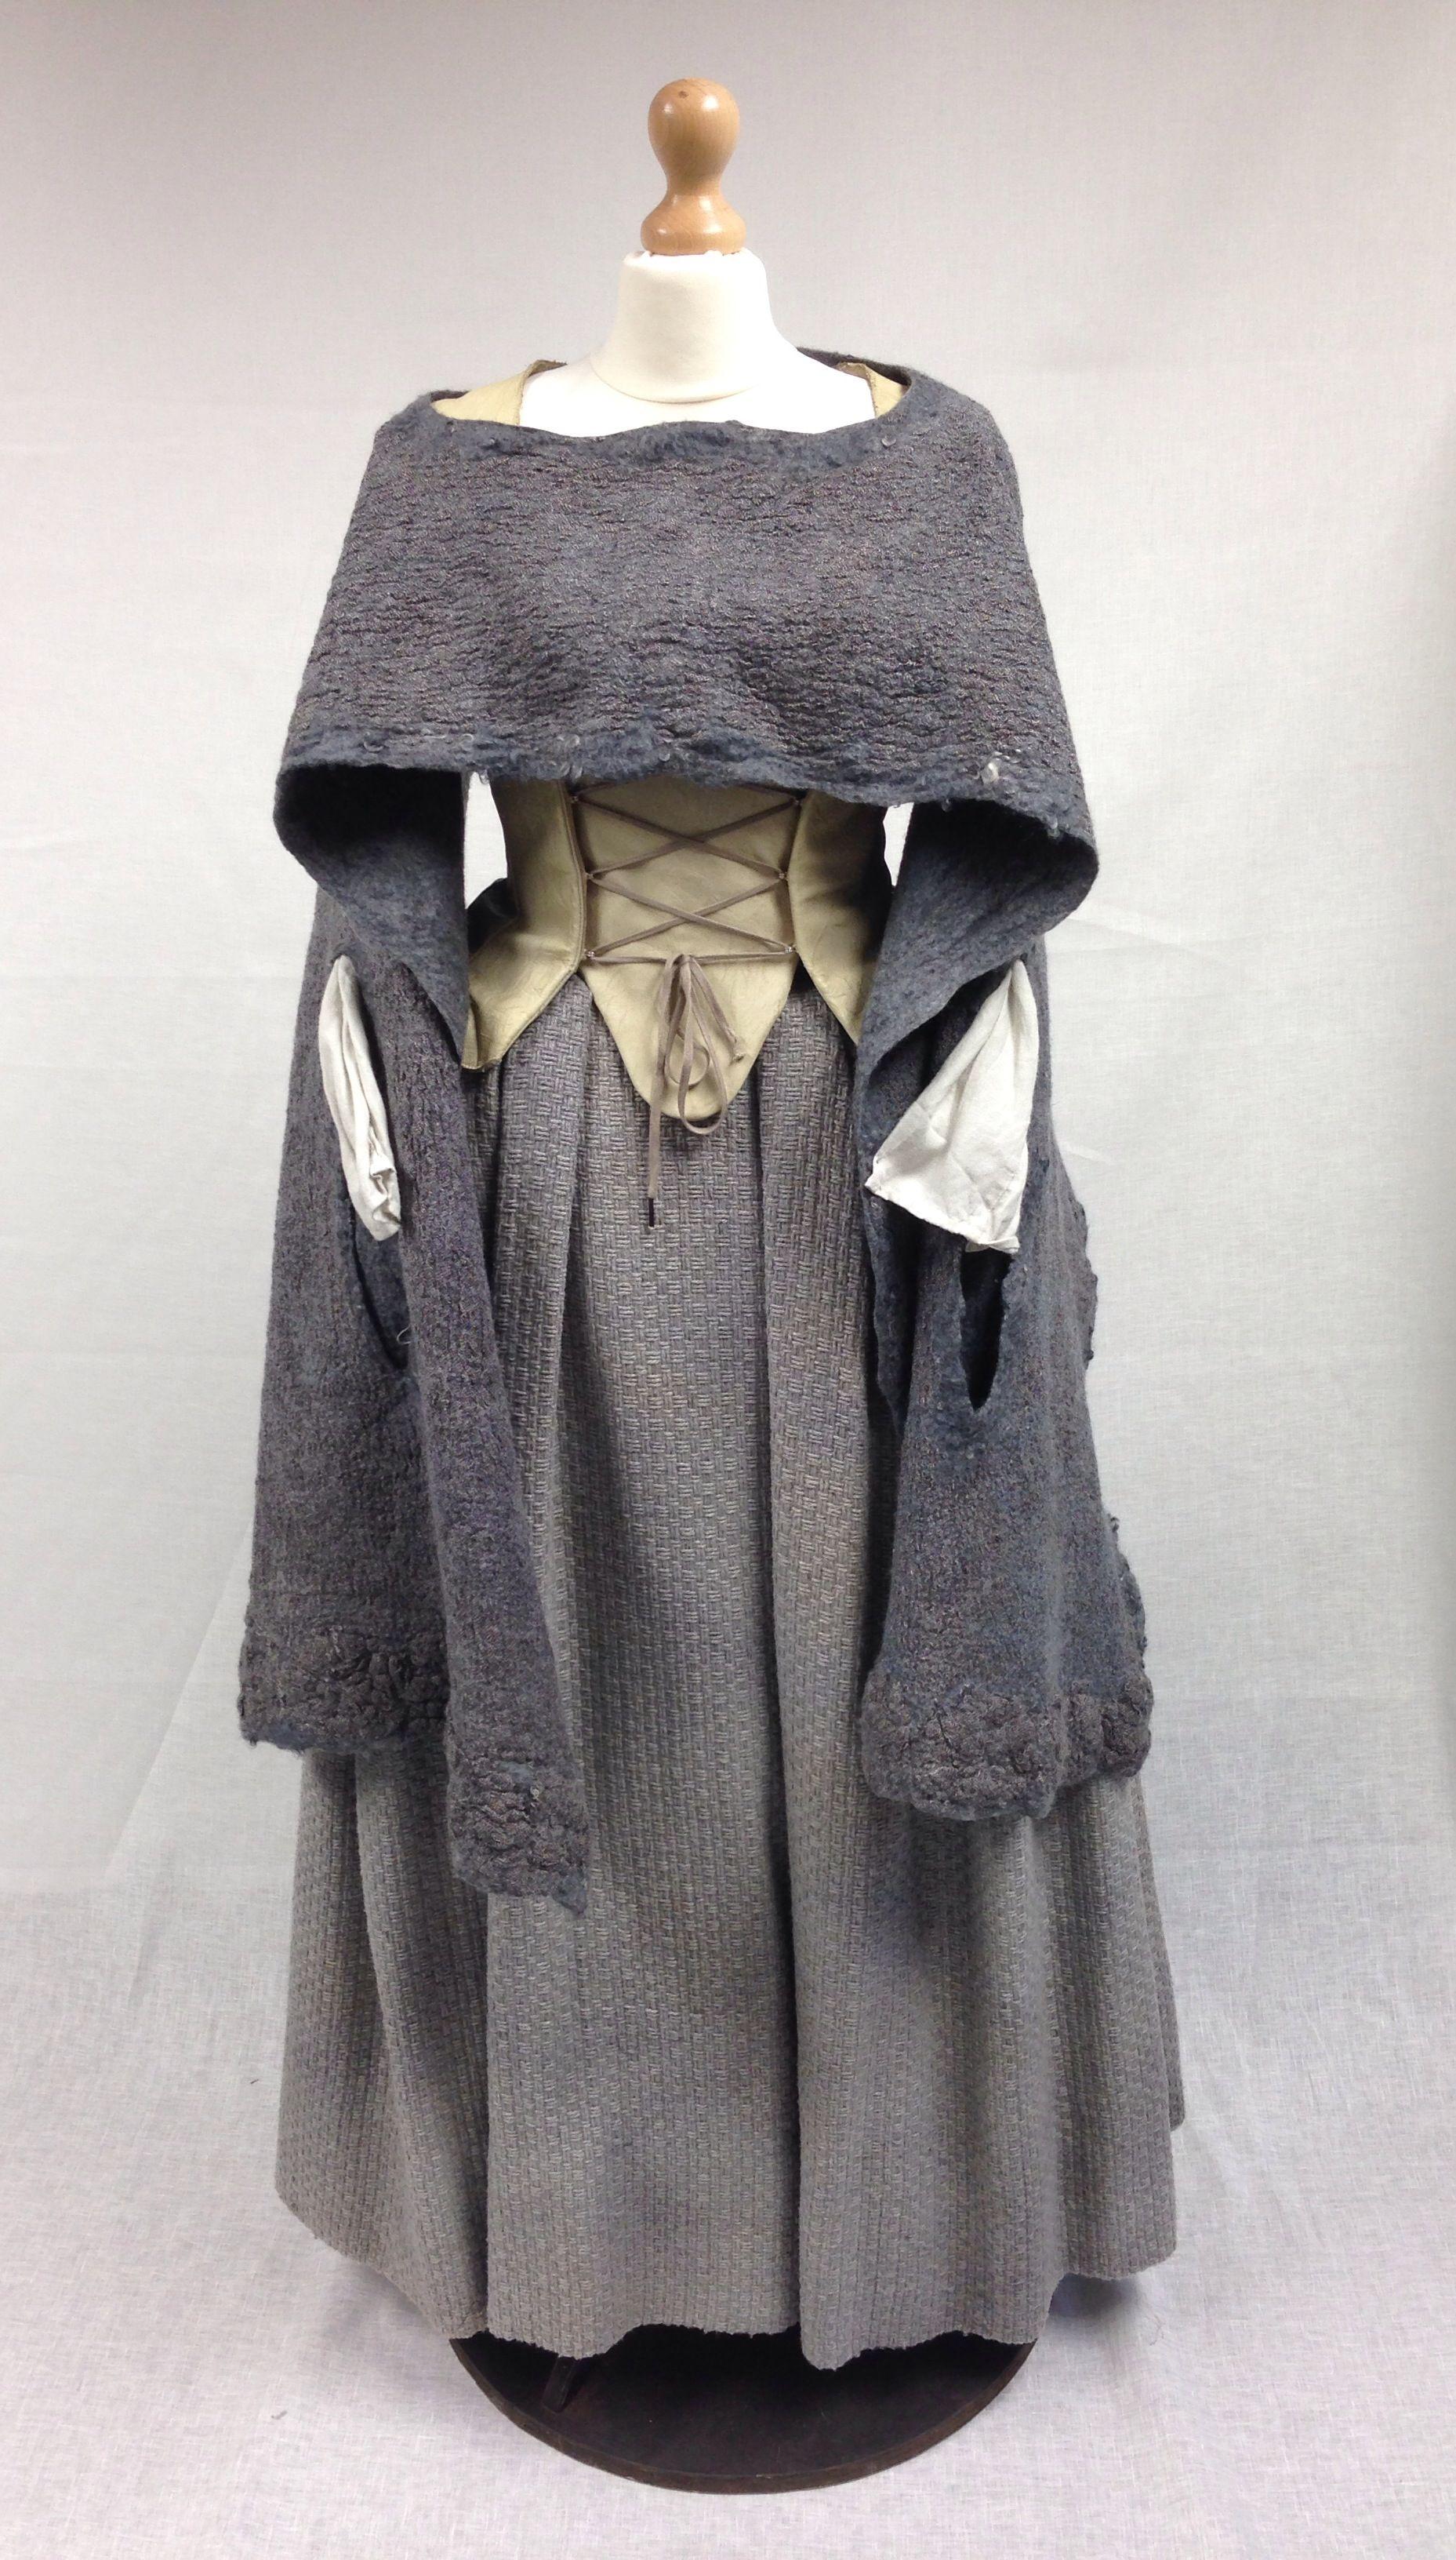 Geillis (Lotte Verbeek) Gardening Dress from Outlander on Starz on ...